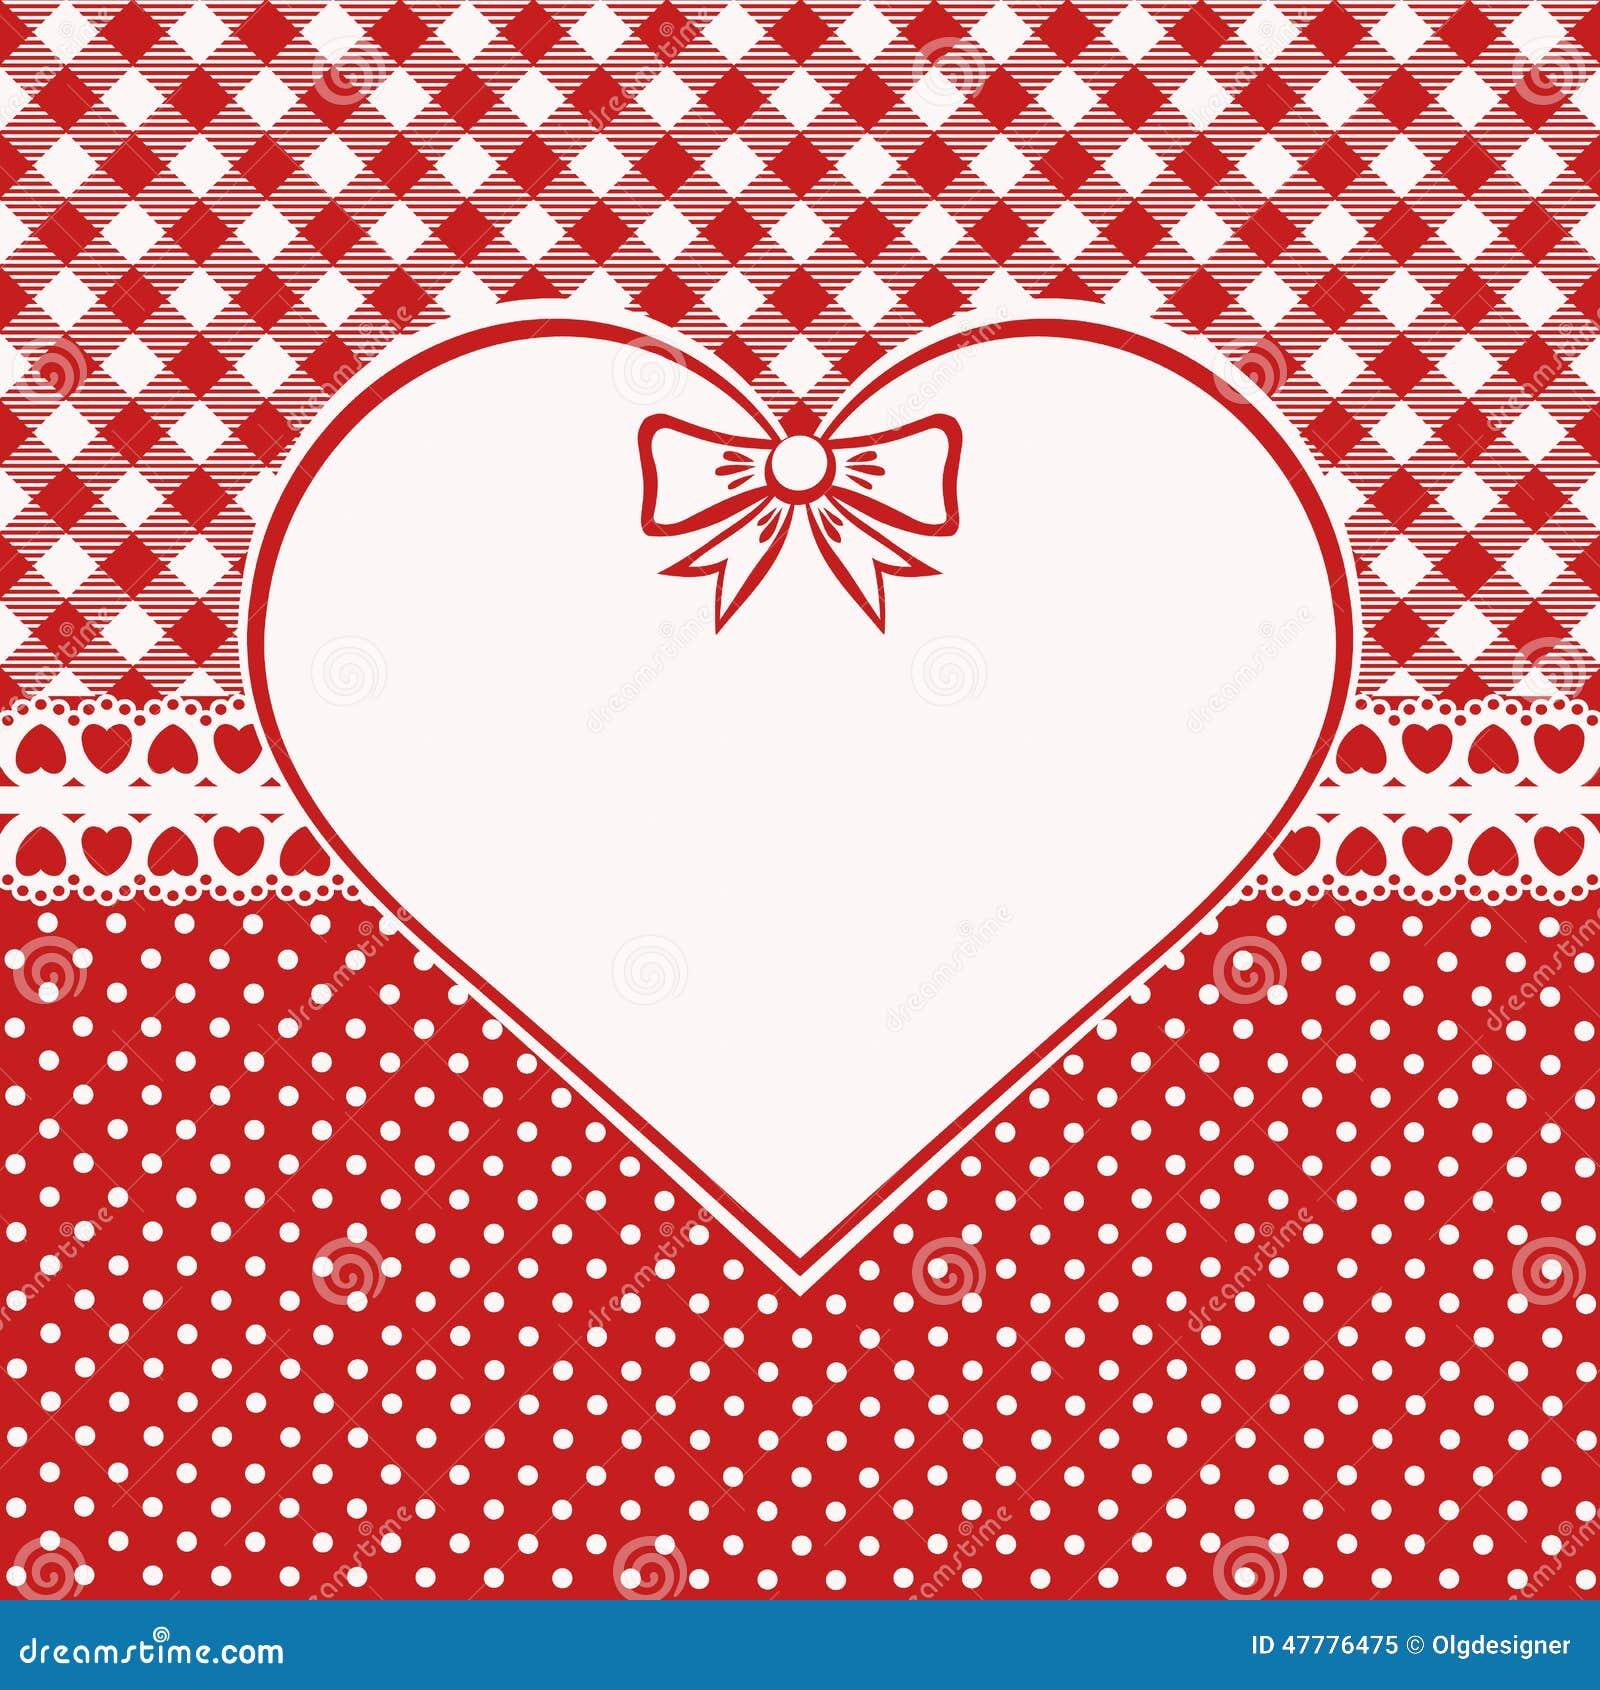 Vintage Valentine Card Stock Vector Illustration Of Border 47776475